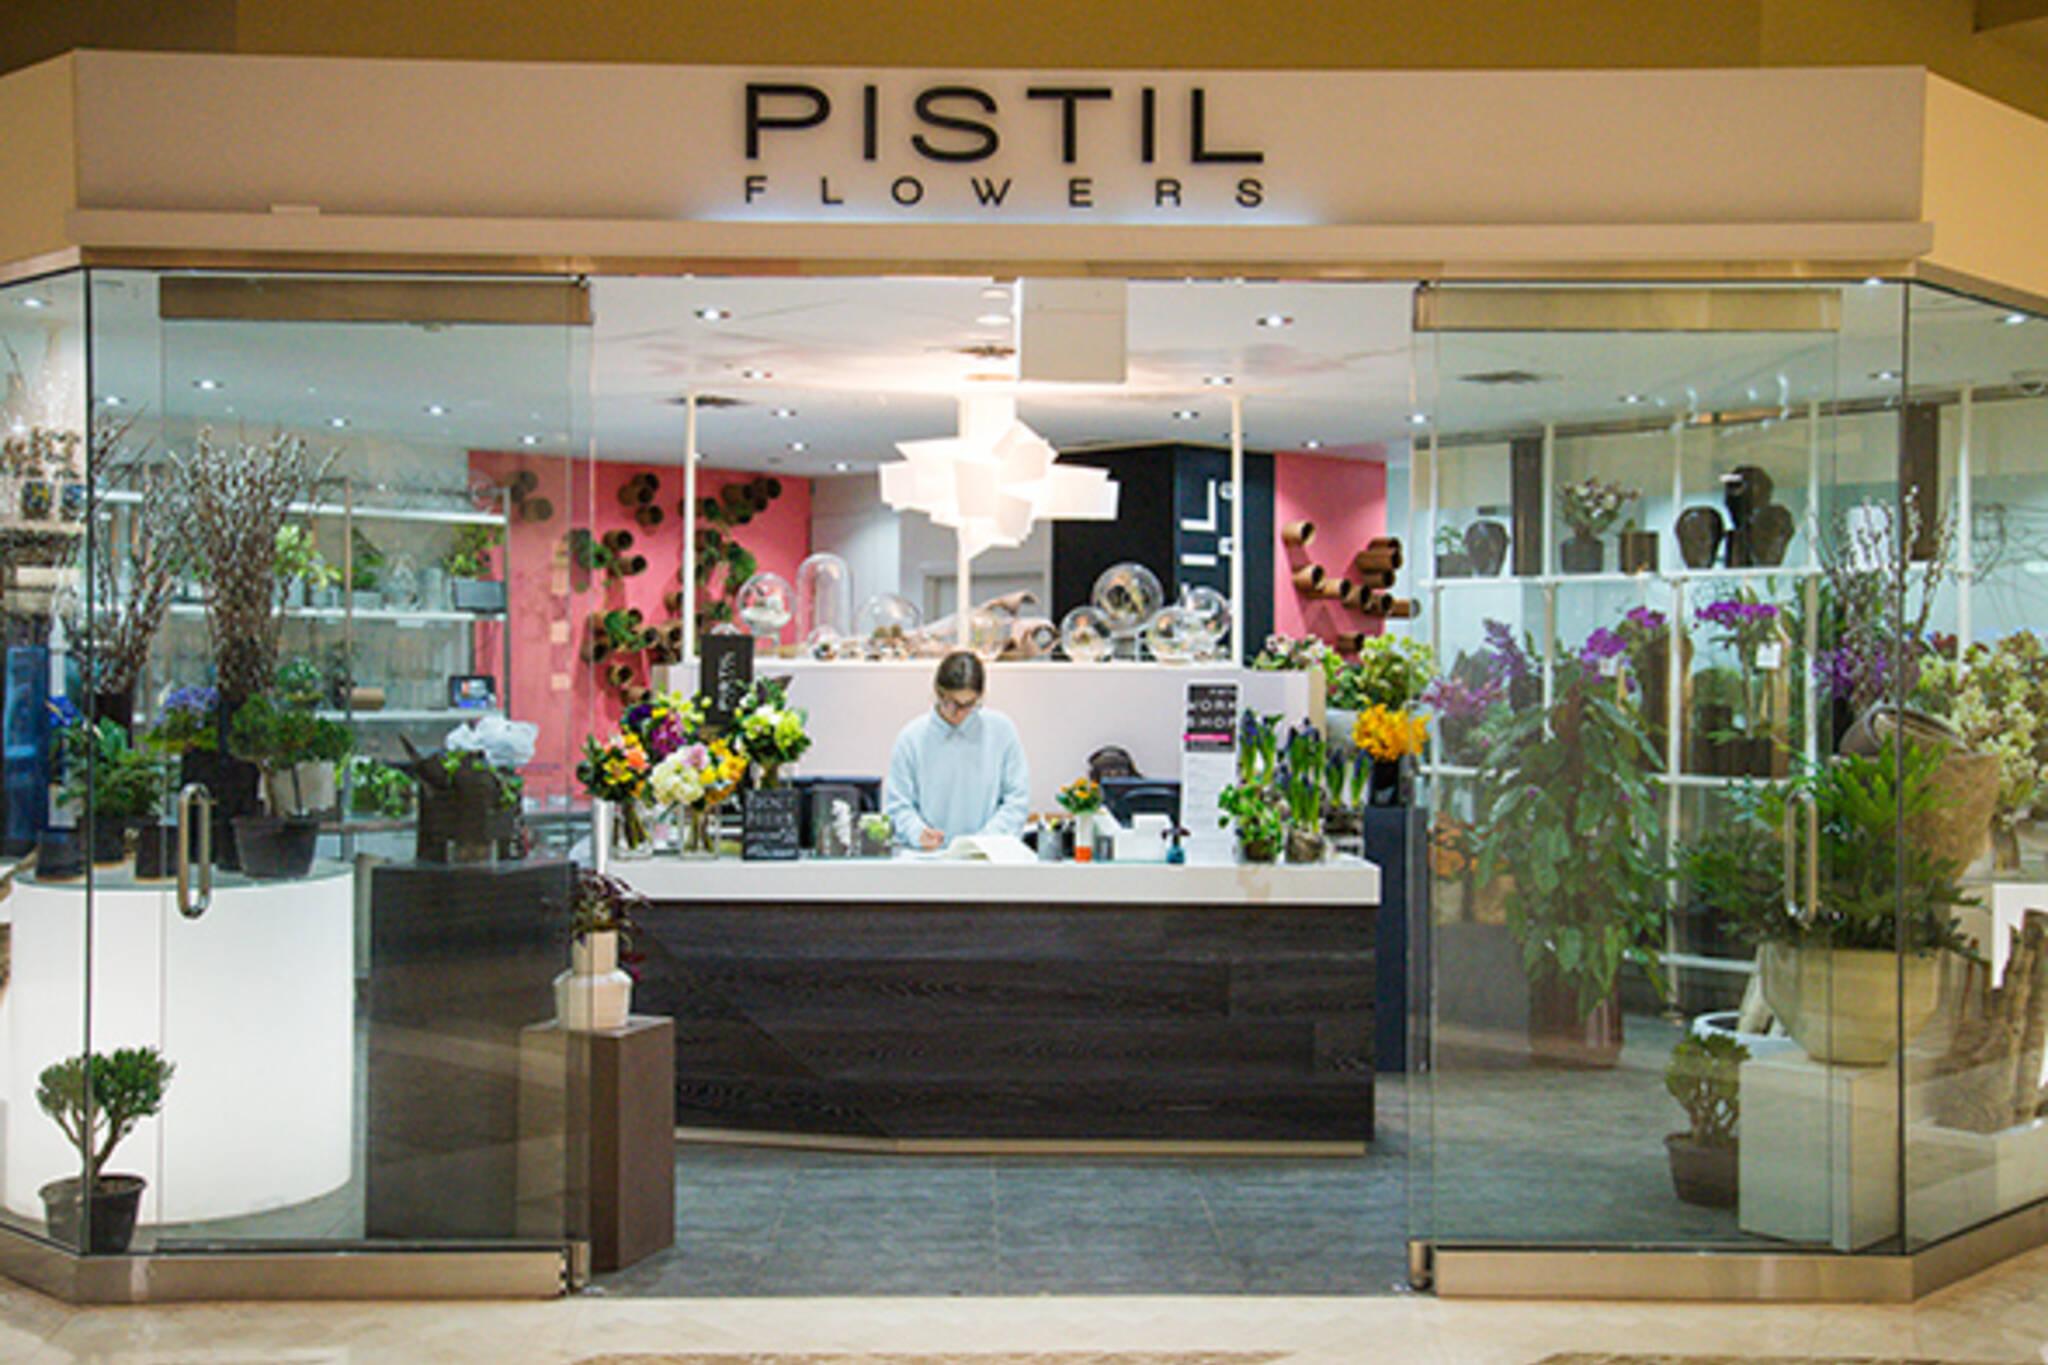 Pistil Flowers (Brookfield Place)